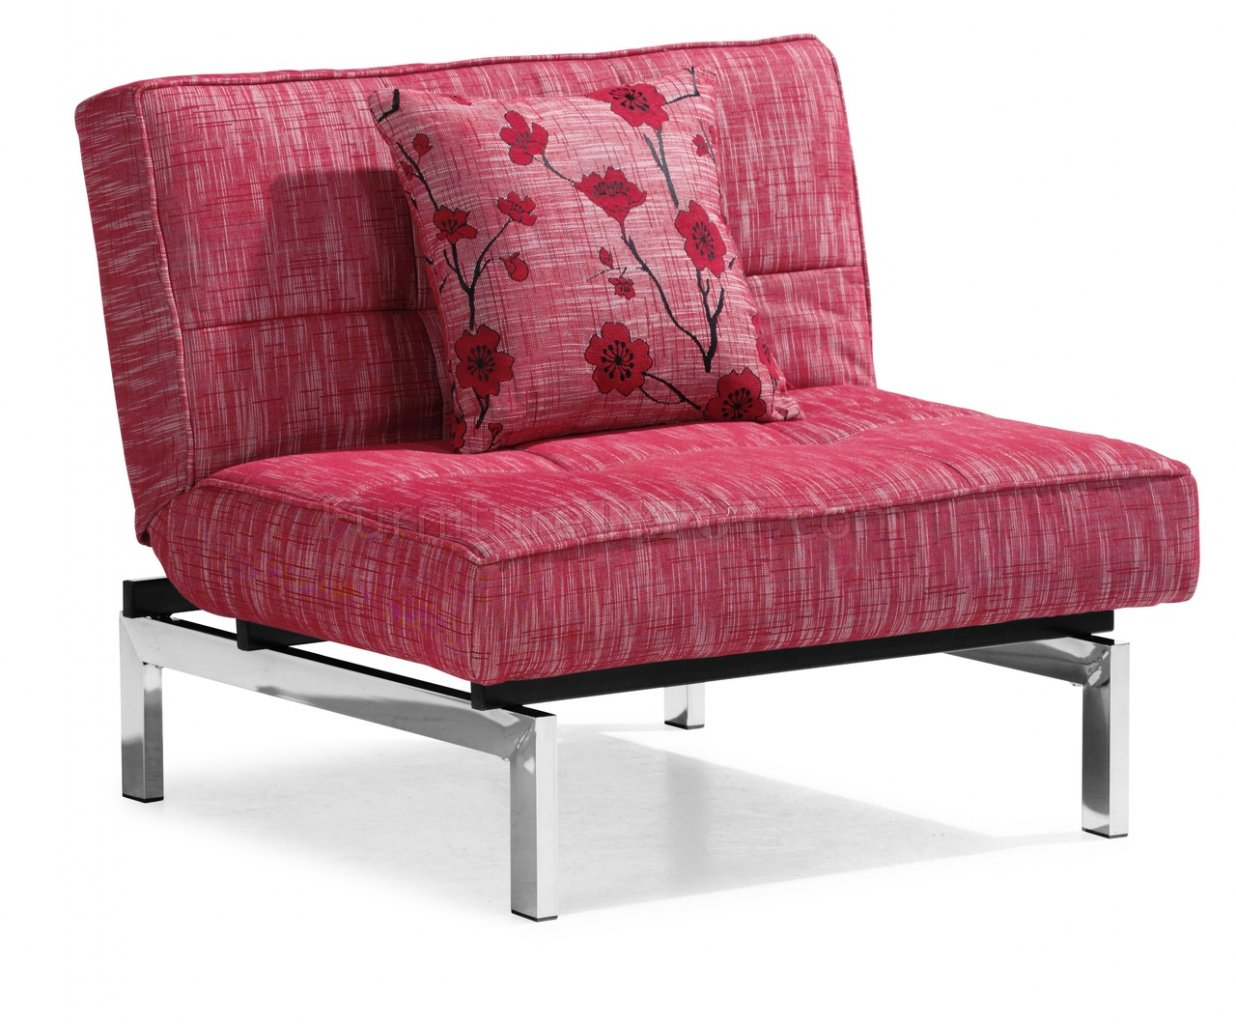 red microfiber sofa medidas kivik 3 plazas convertible sleeper with split back